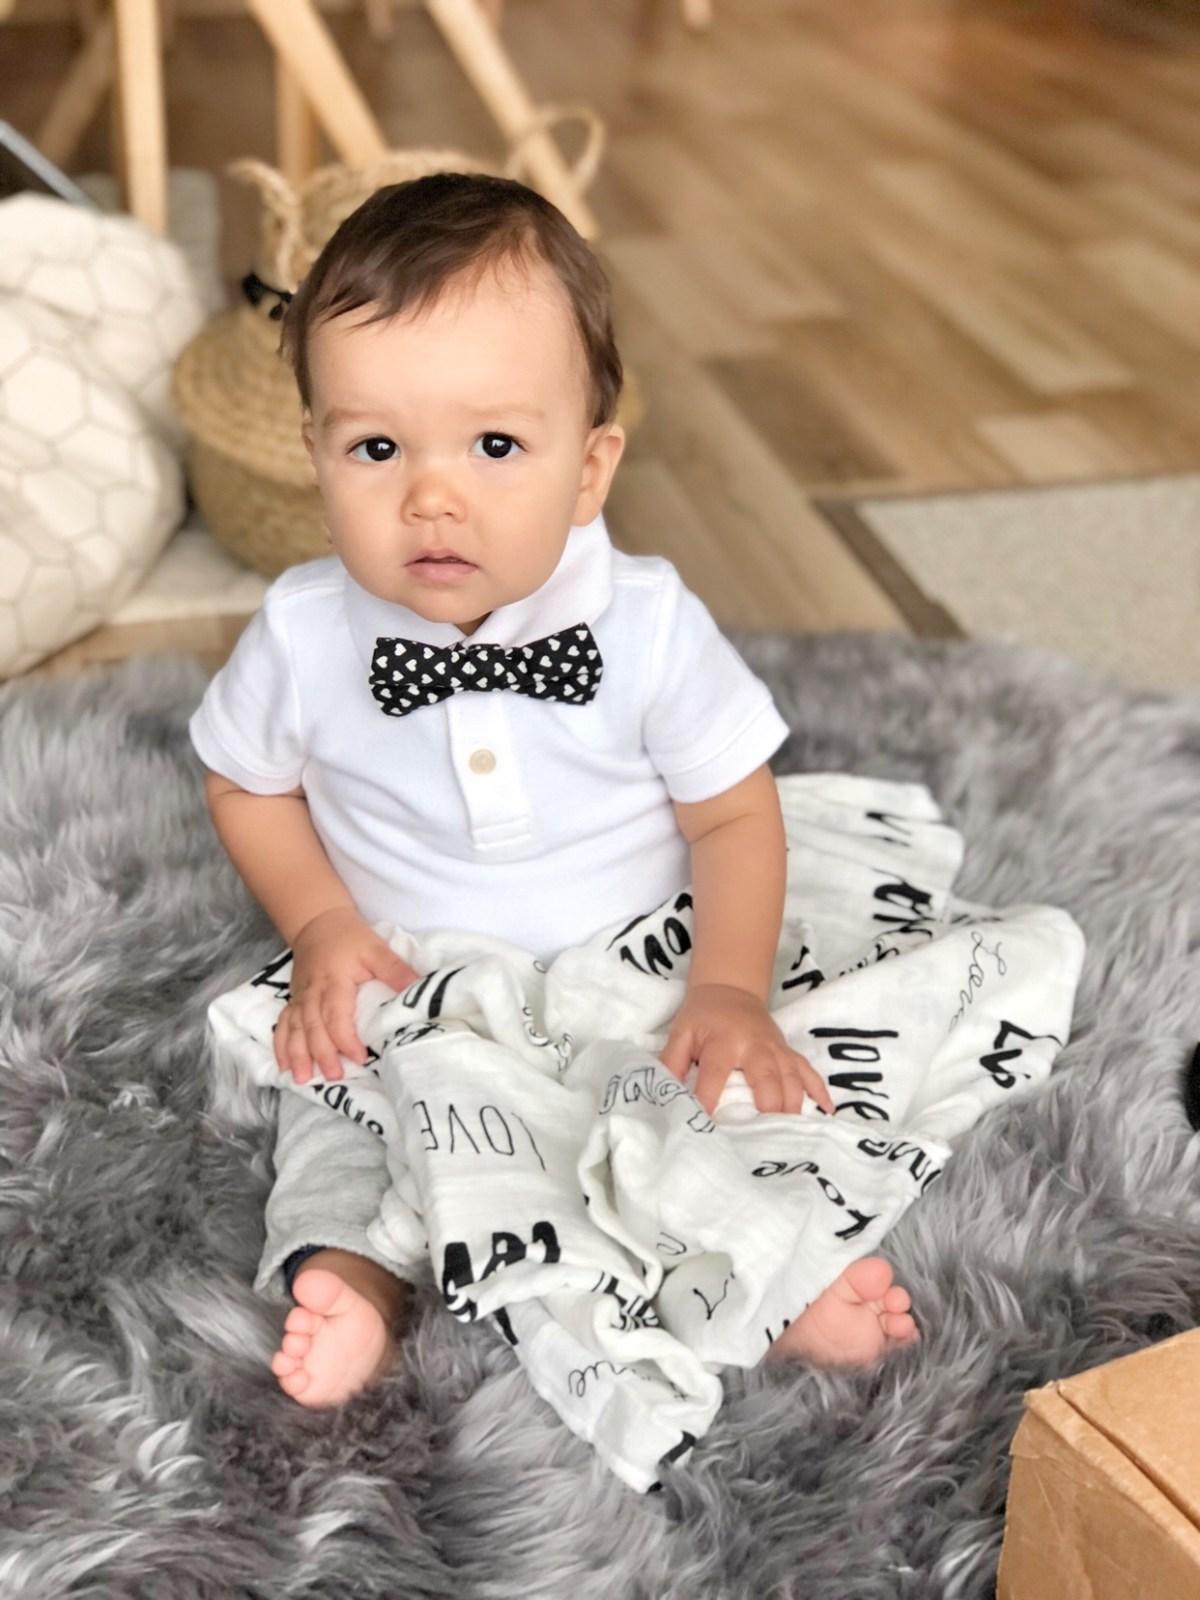 cute baby boy with bowtie